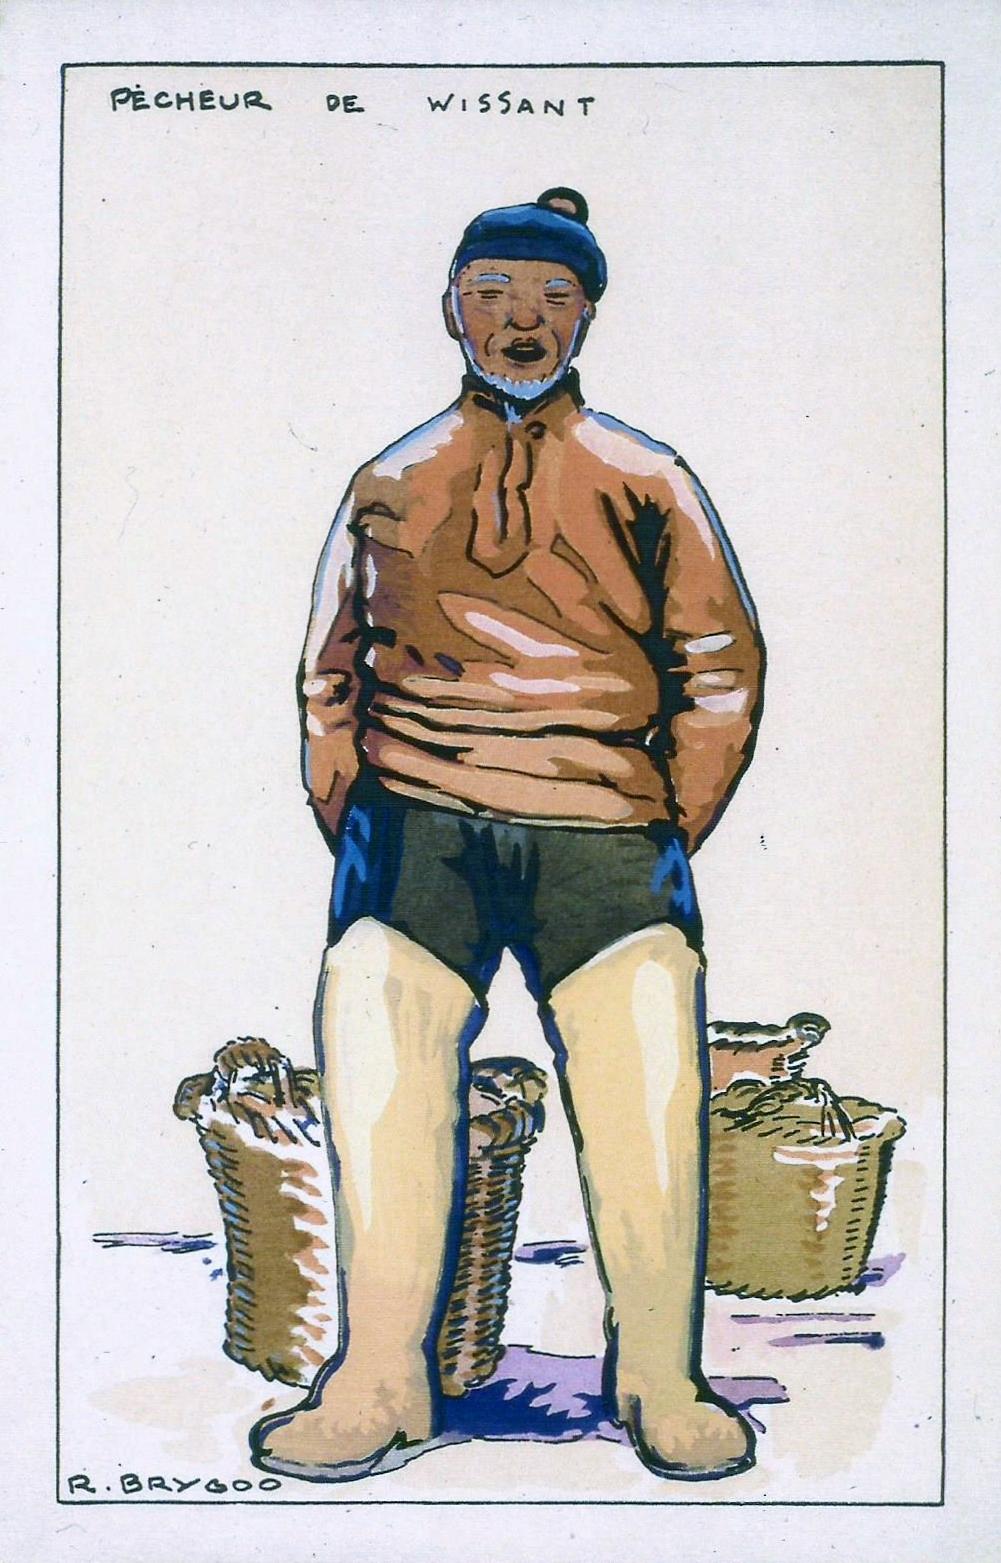 Raoul Brygoo pêcheur de Wissant